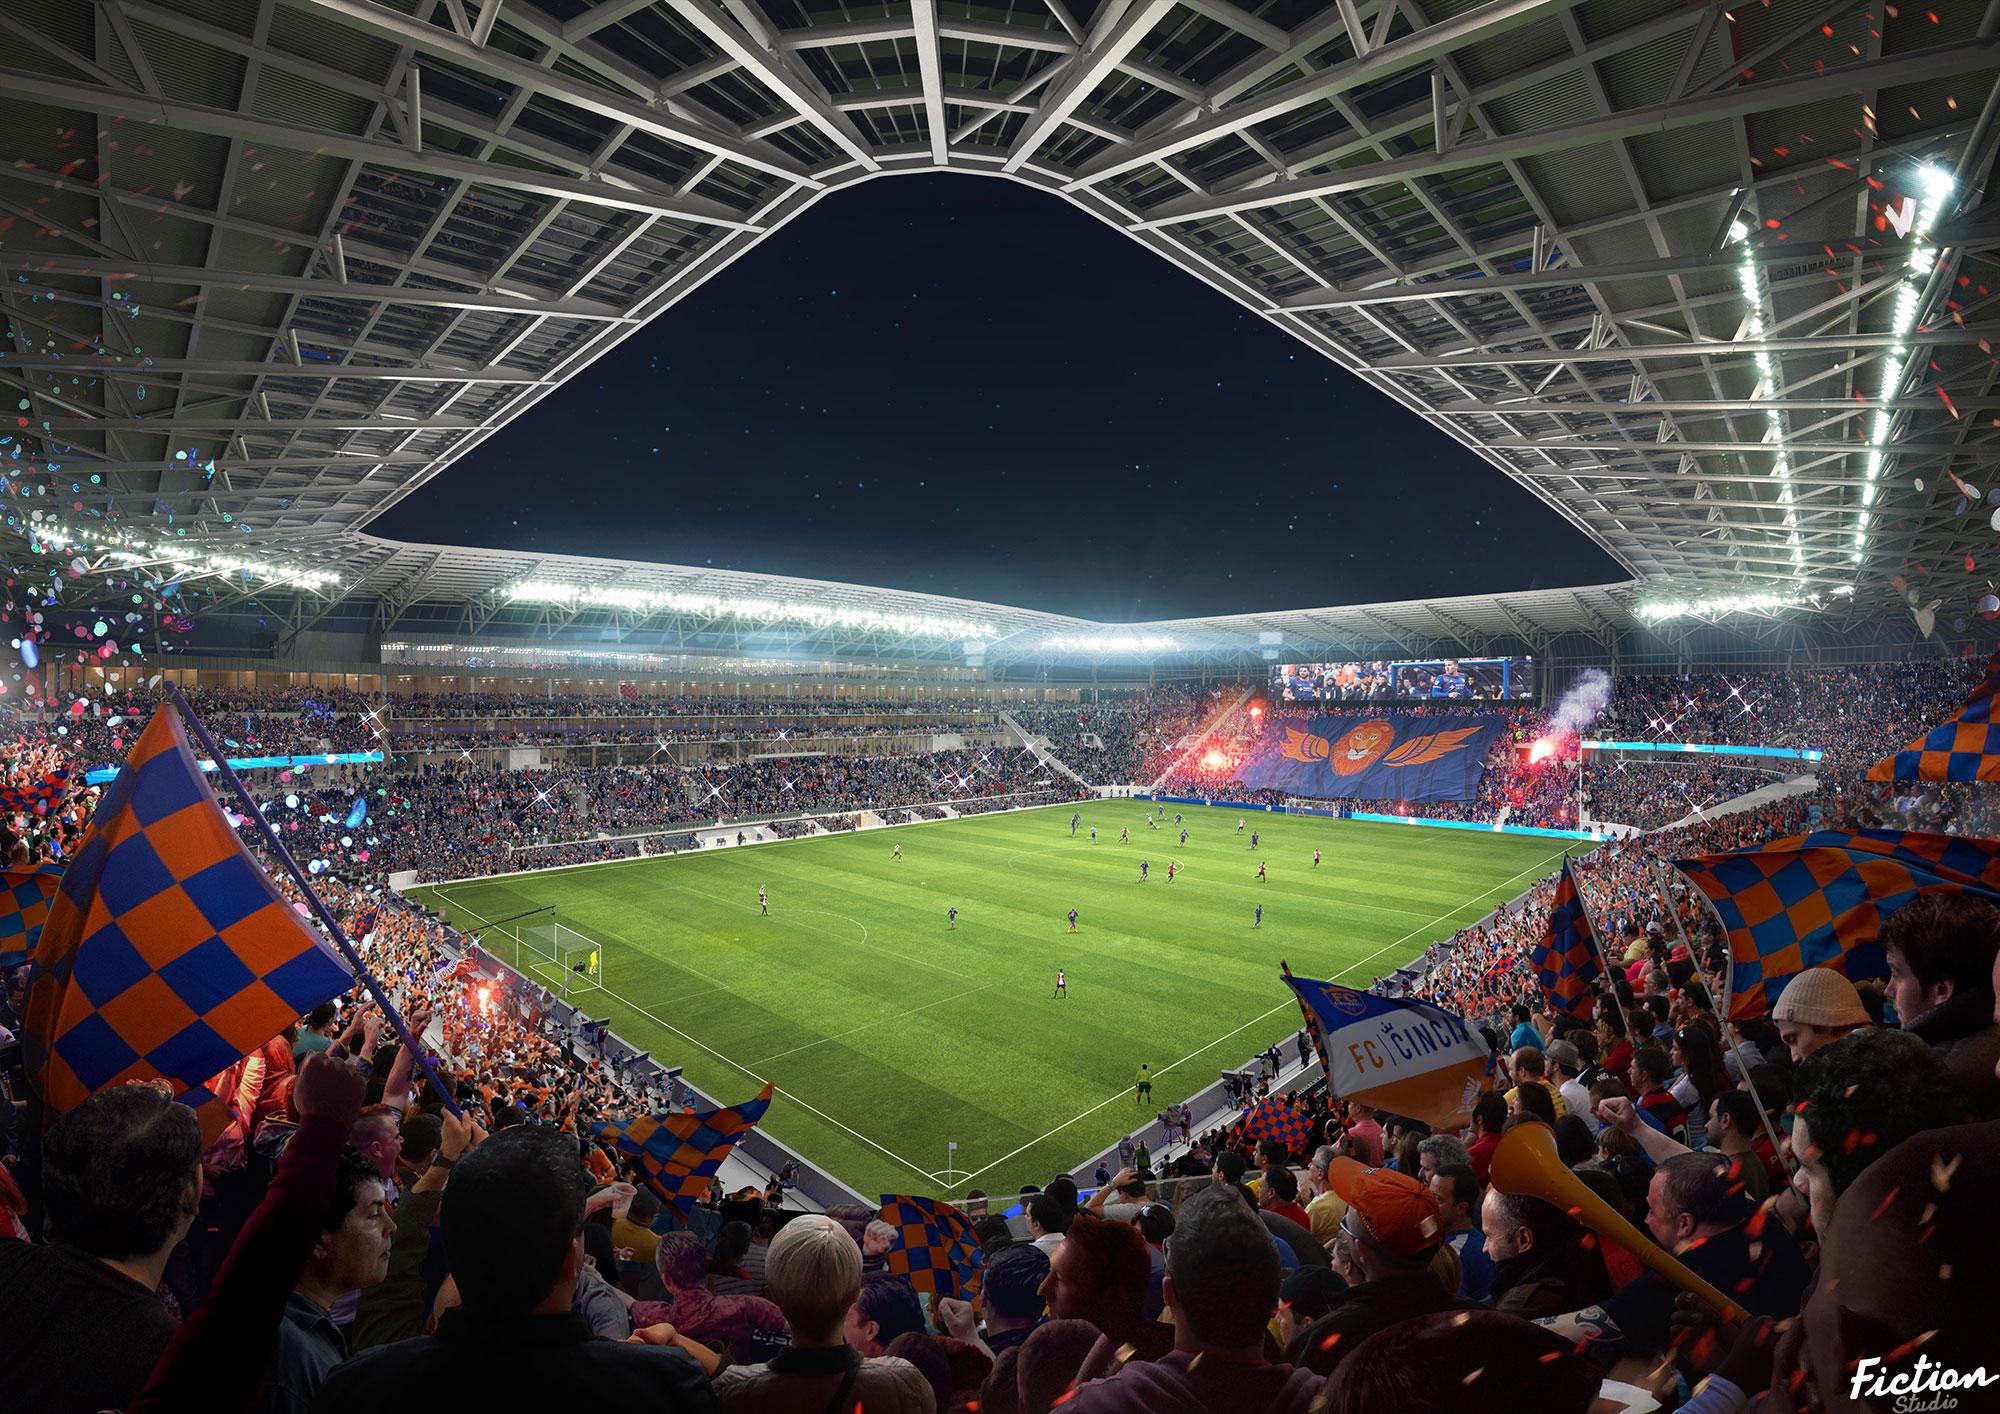 Populous - FCC Soccer Stadium - USA